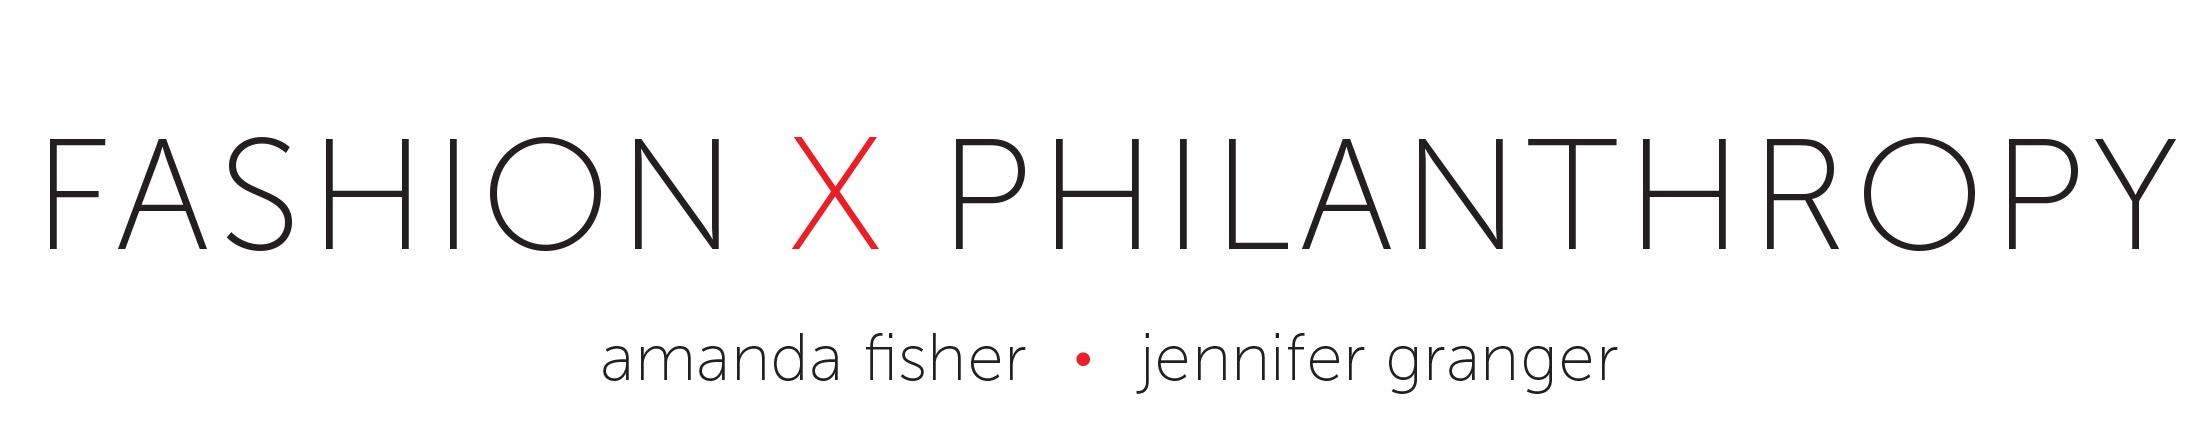 FashionXPhilanthropy_names_white.jpg